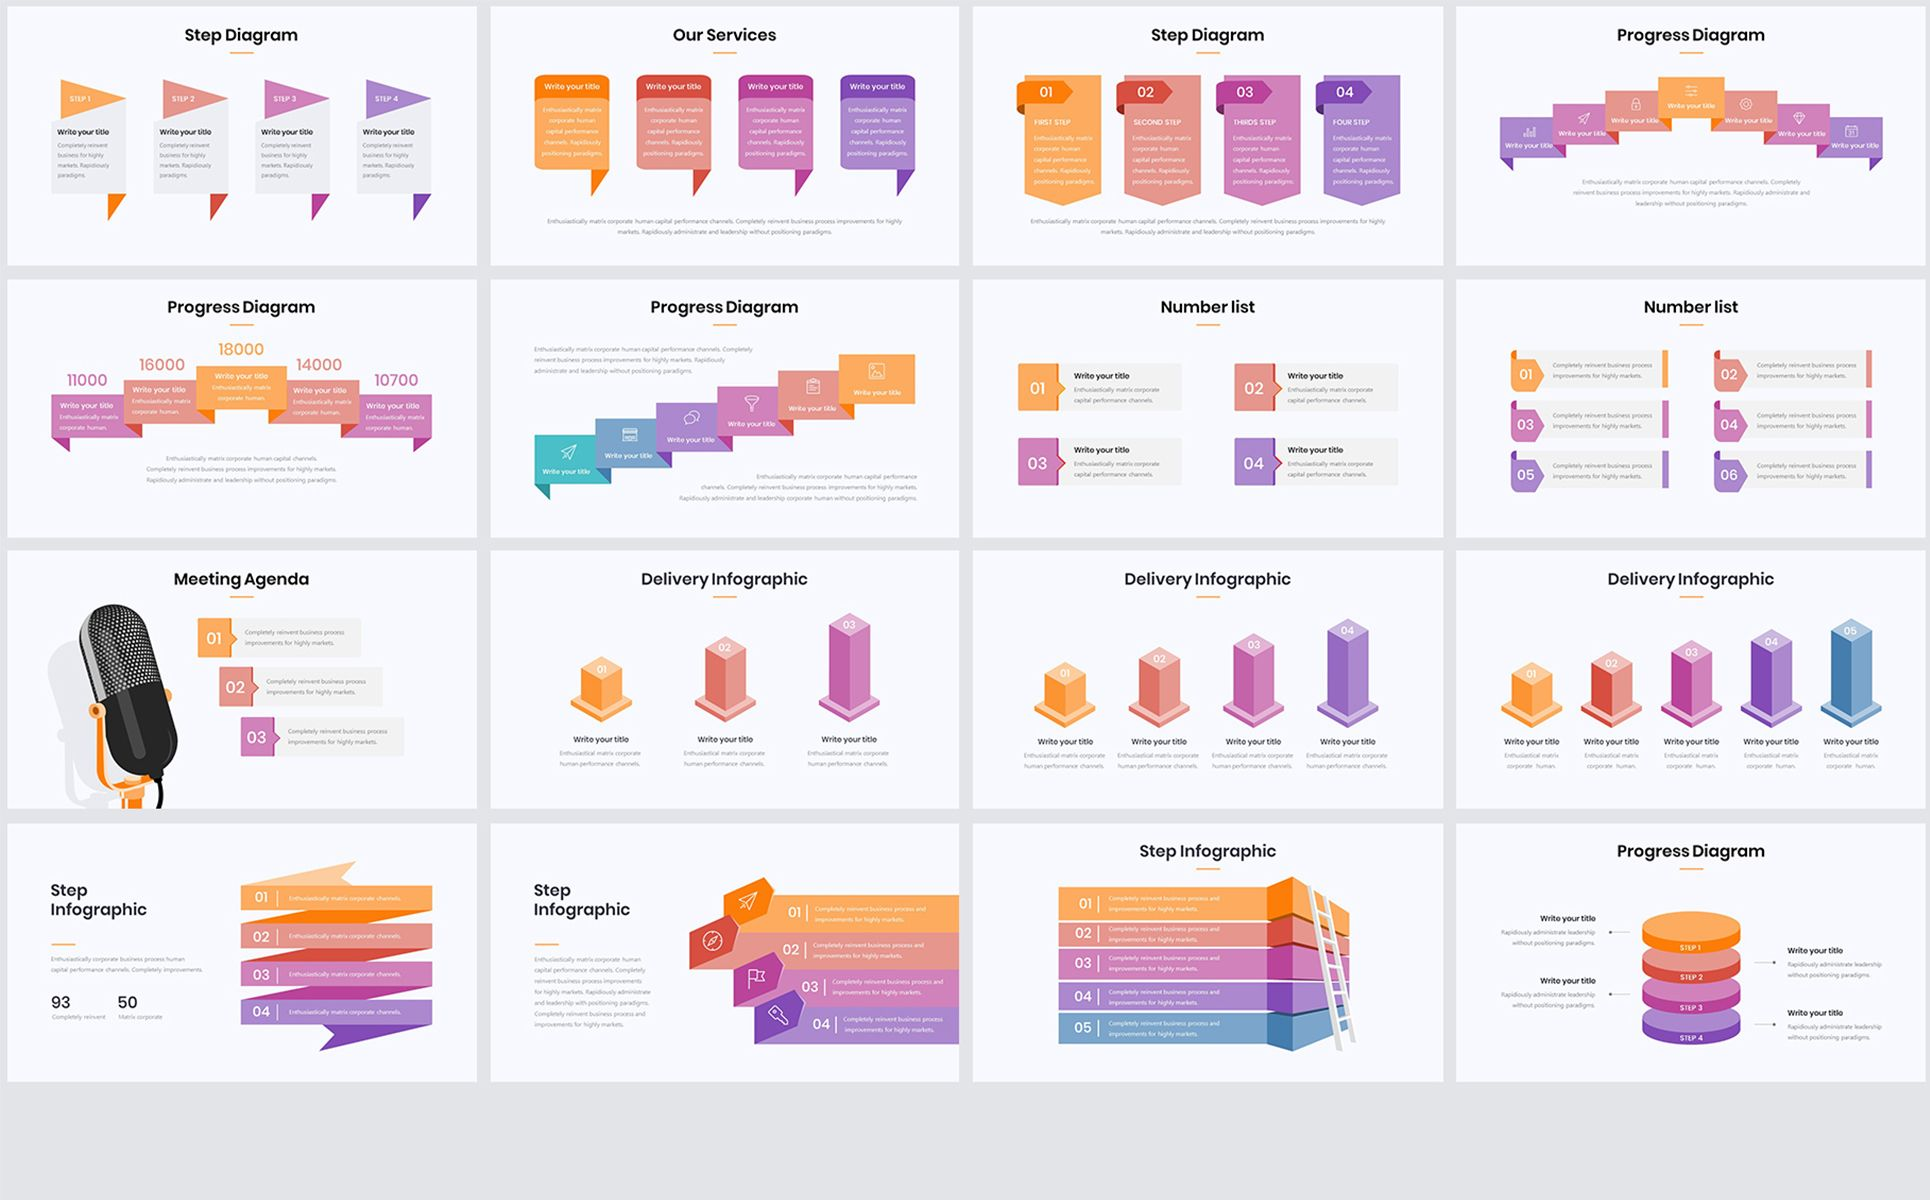 Millionaire-Elegant Infographic Pack 1 1 PowerPoint Template